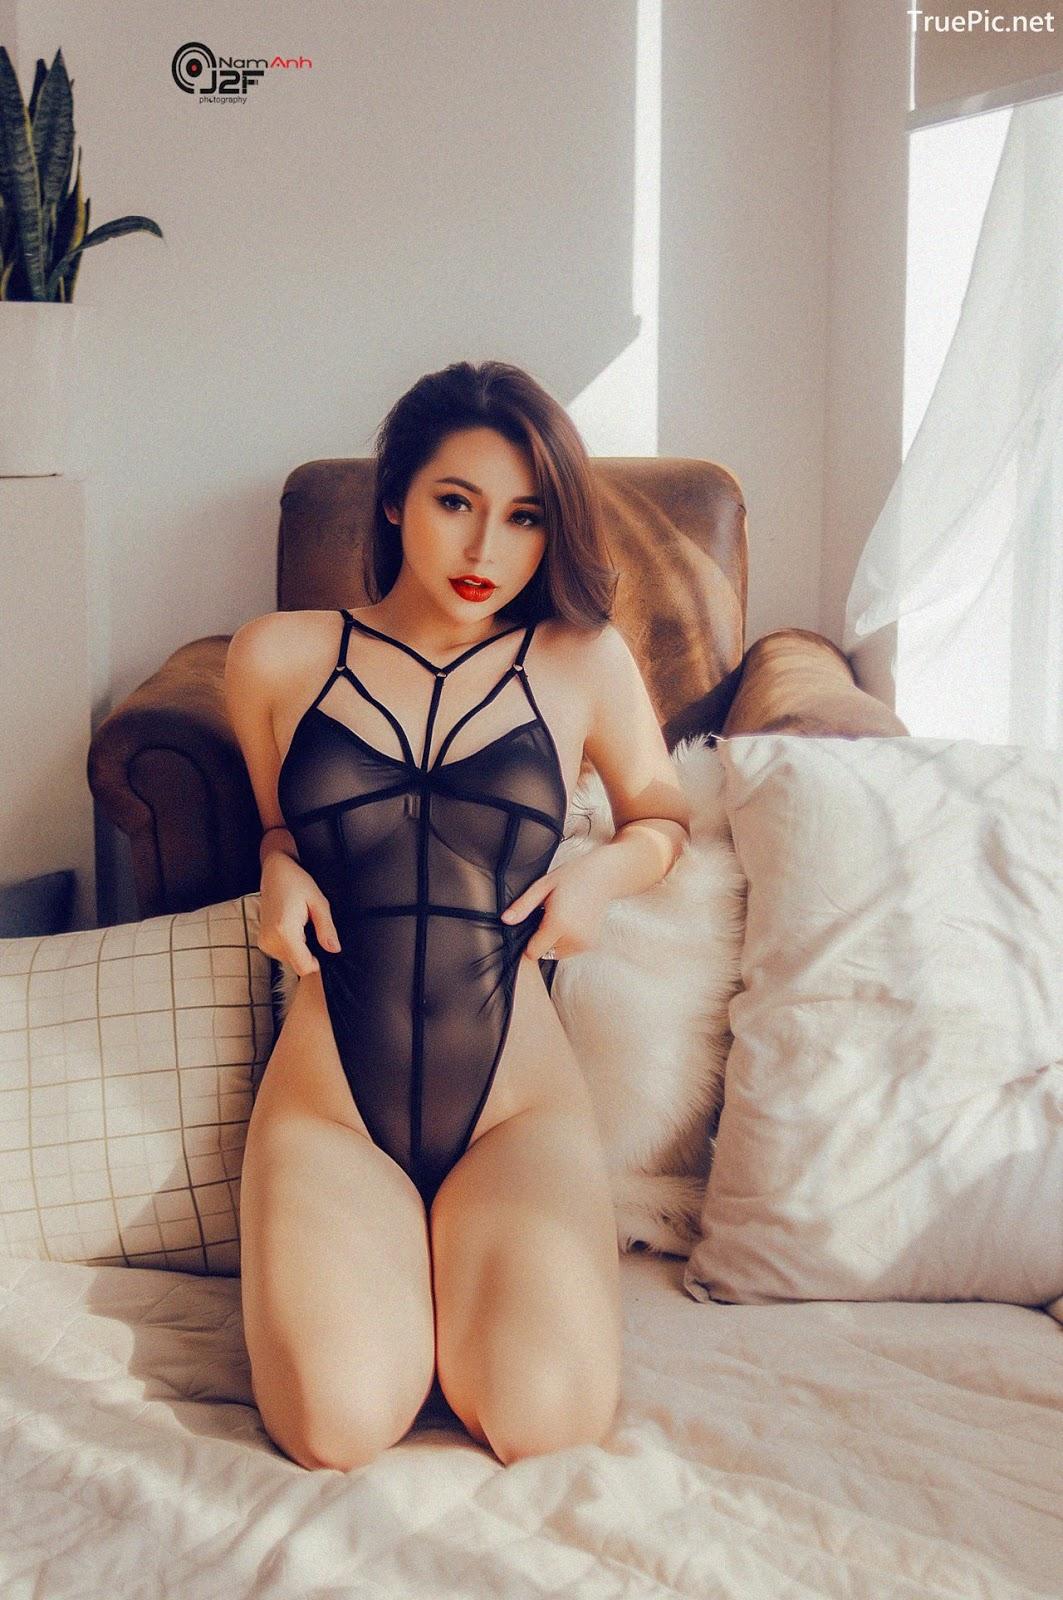 Image Vietnamese Model – Sexy Beauty of Beautiful Girls Taken by NamAnh Photo #8 - TruePic.net - Picture-7